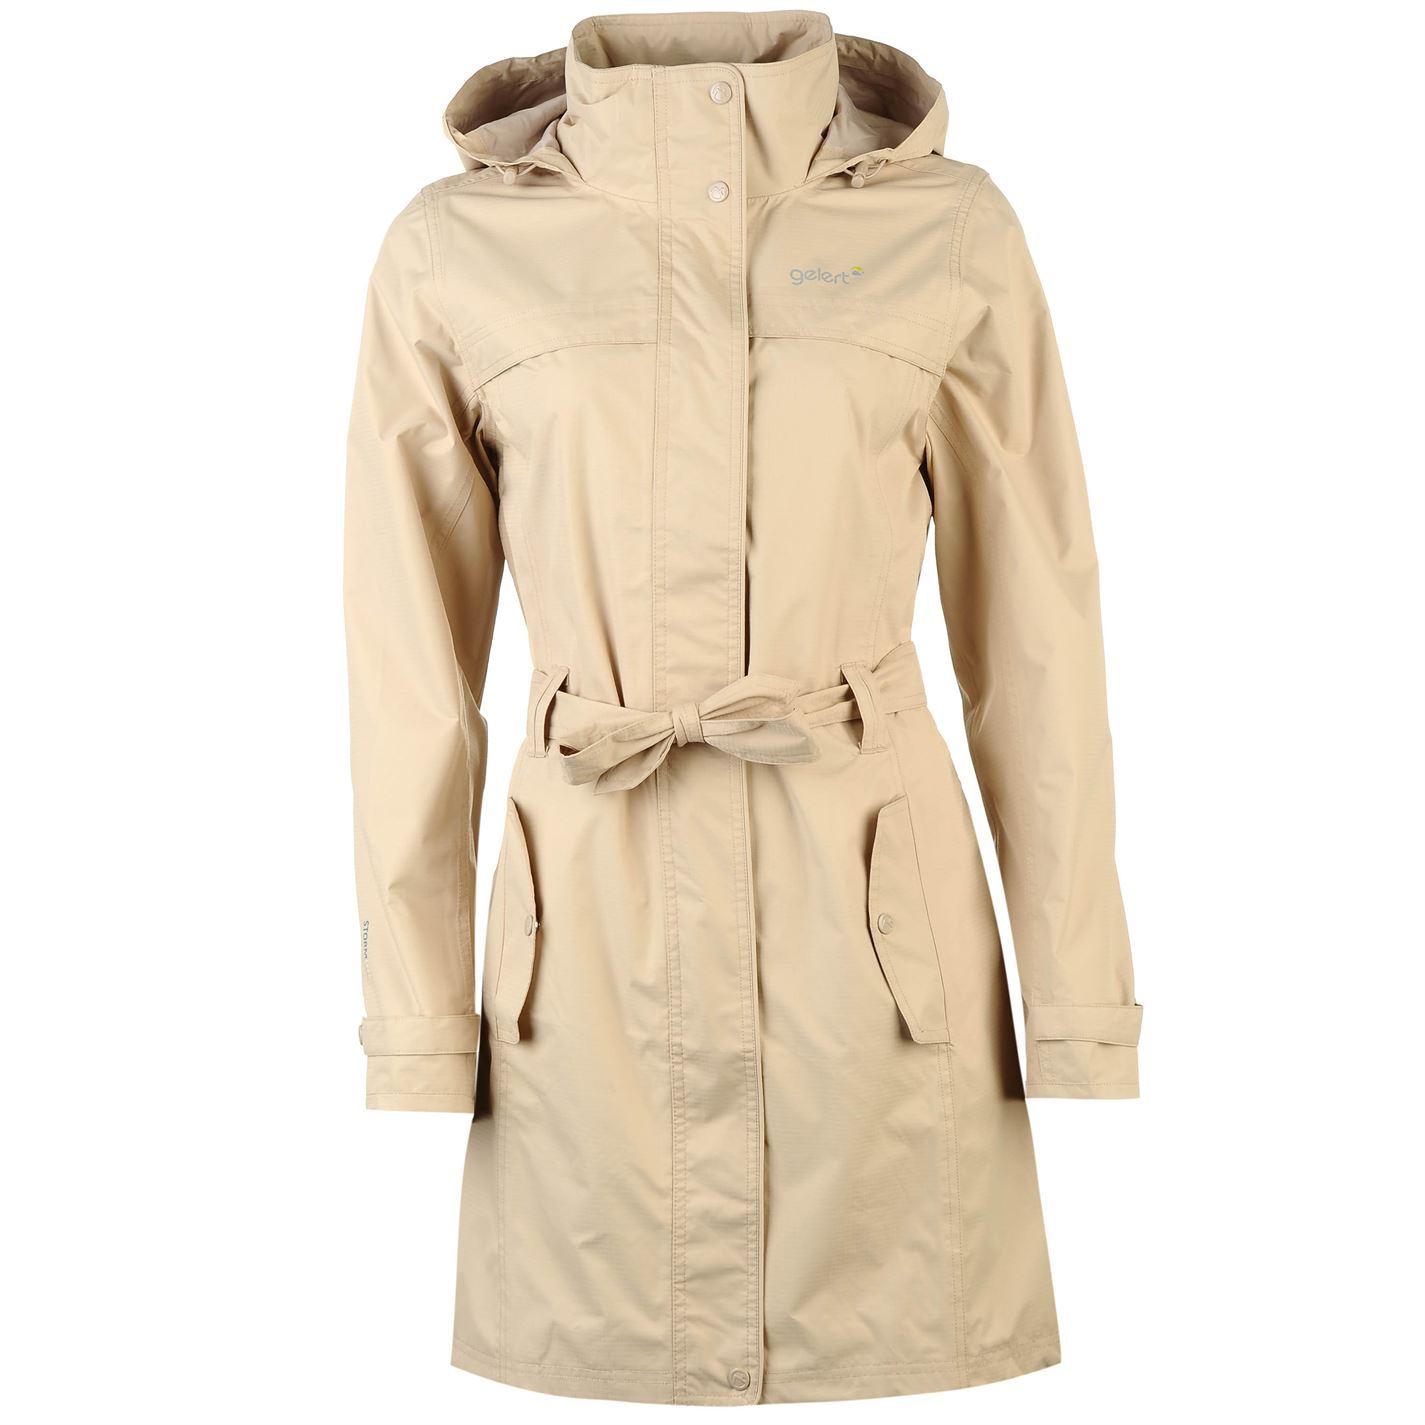 84d1dbb52b26 Gelert Womens Fairlight Jacket Top Coat Waterproof Hooded Full Zip ...